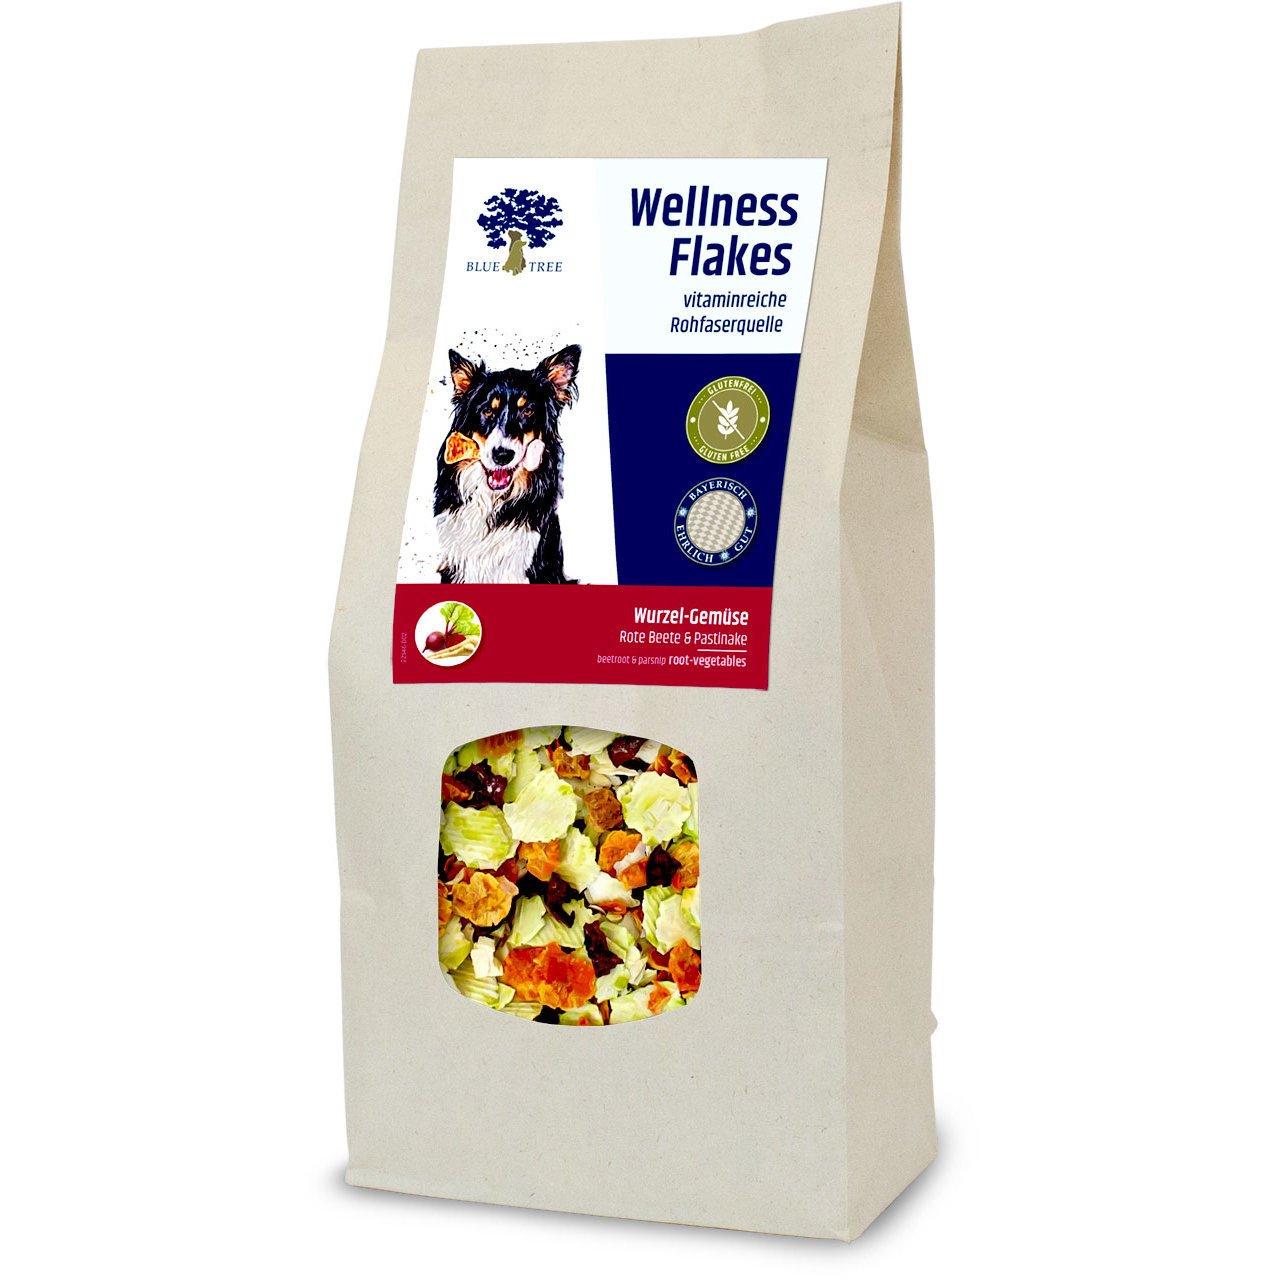 Blue Tree Wellness Flakes für Hunde, Bild 4